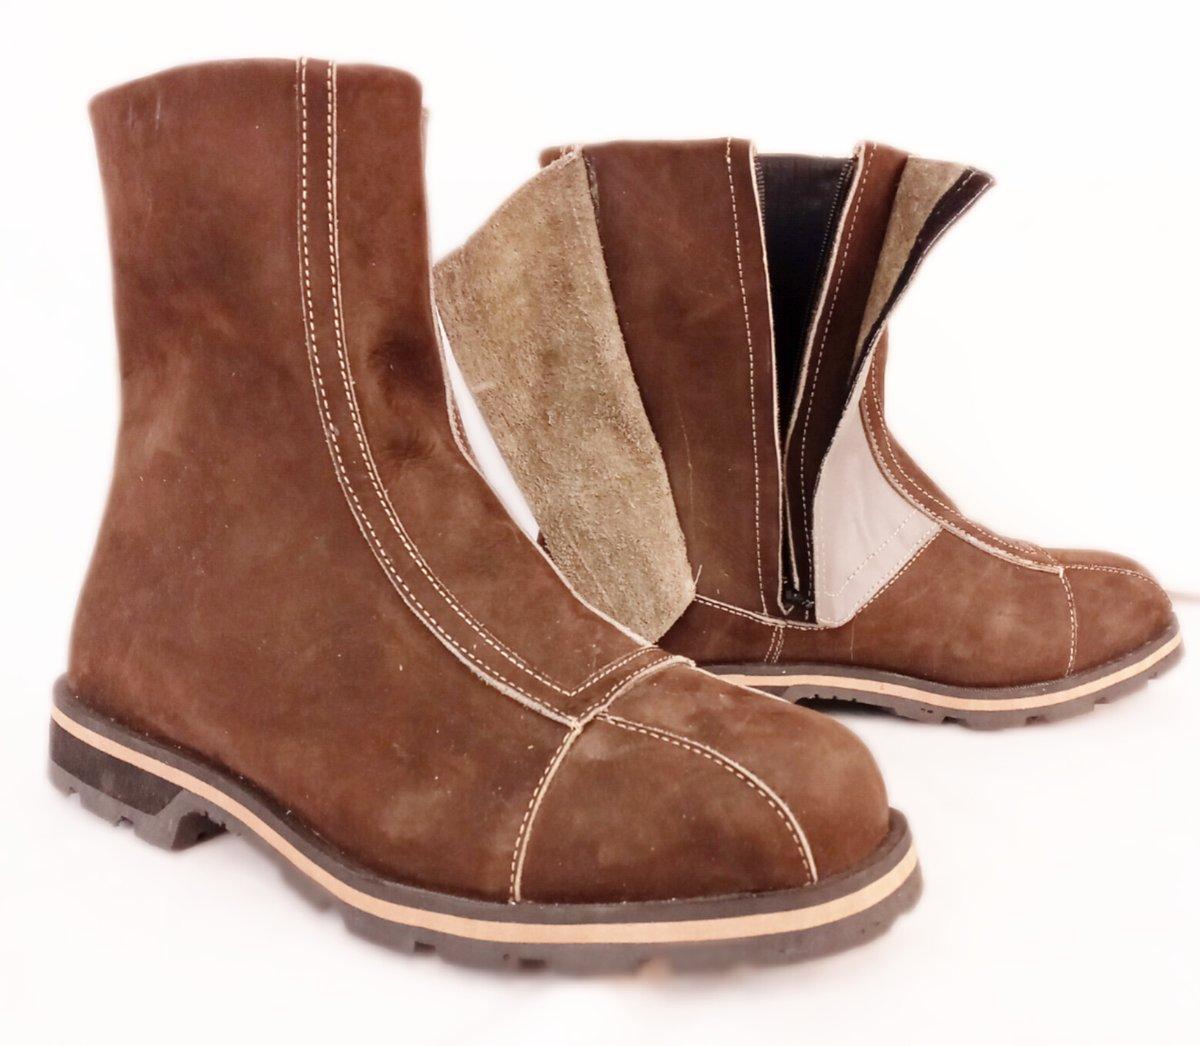 Image of #19 - B Grade from Stock - Shoe Size EU 43